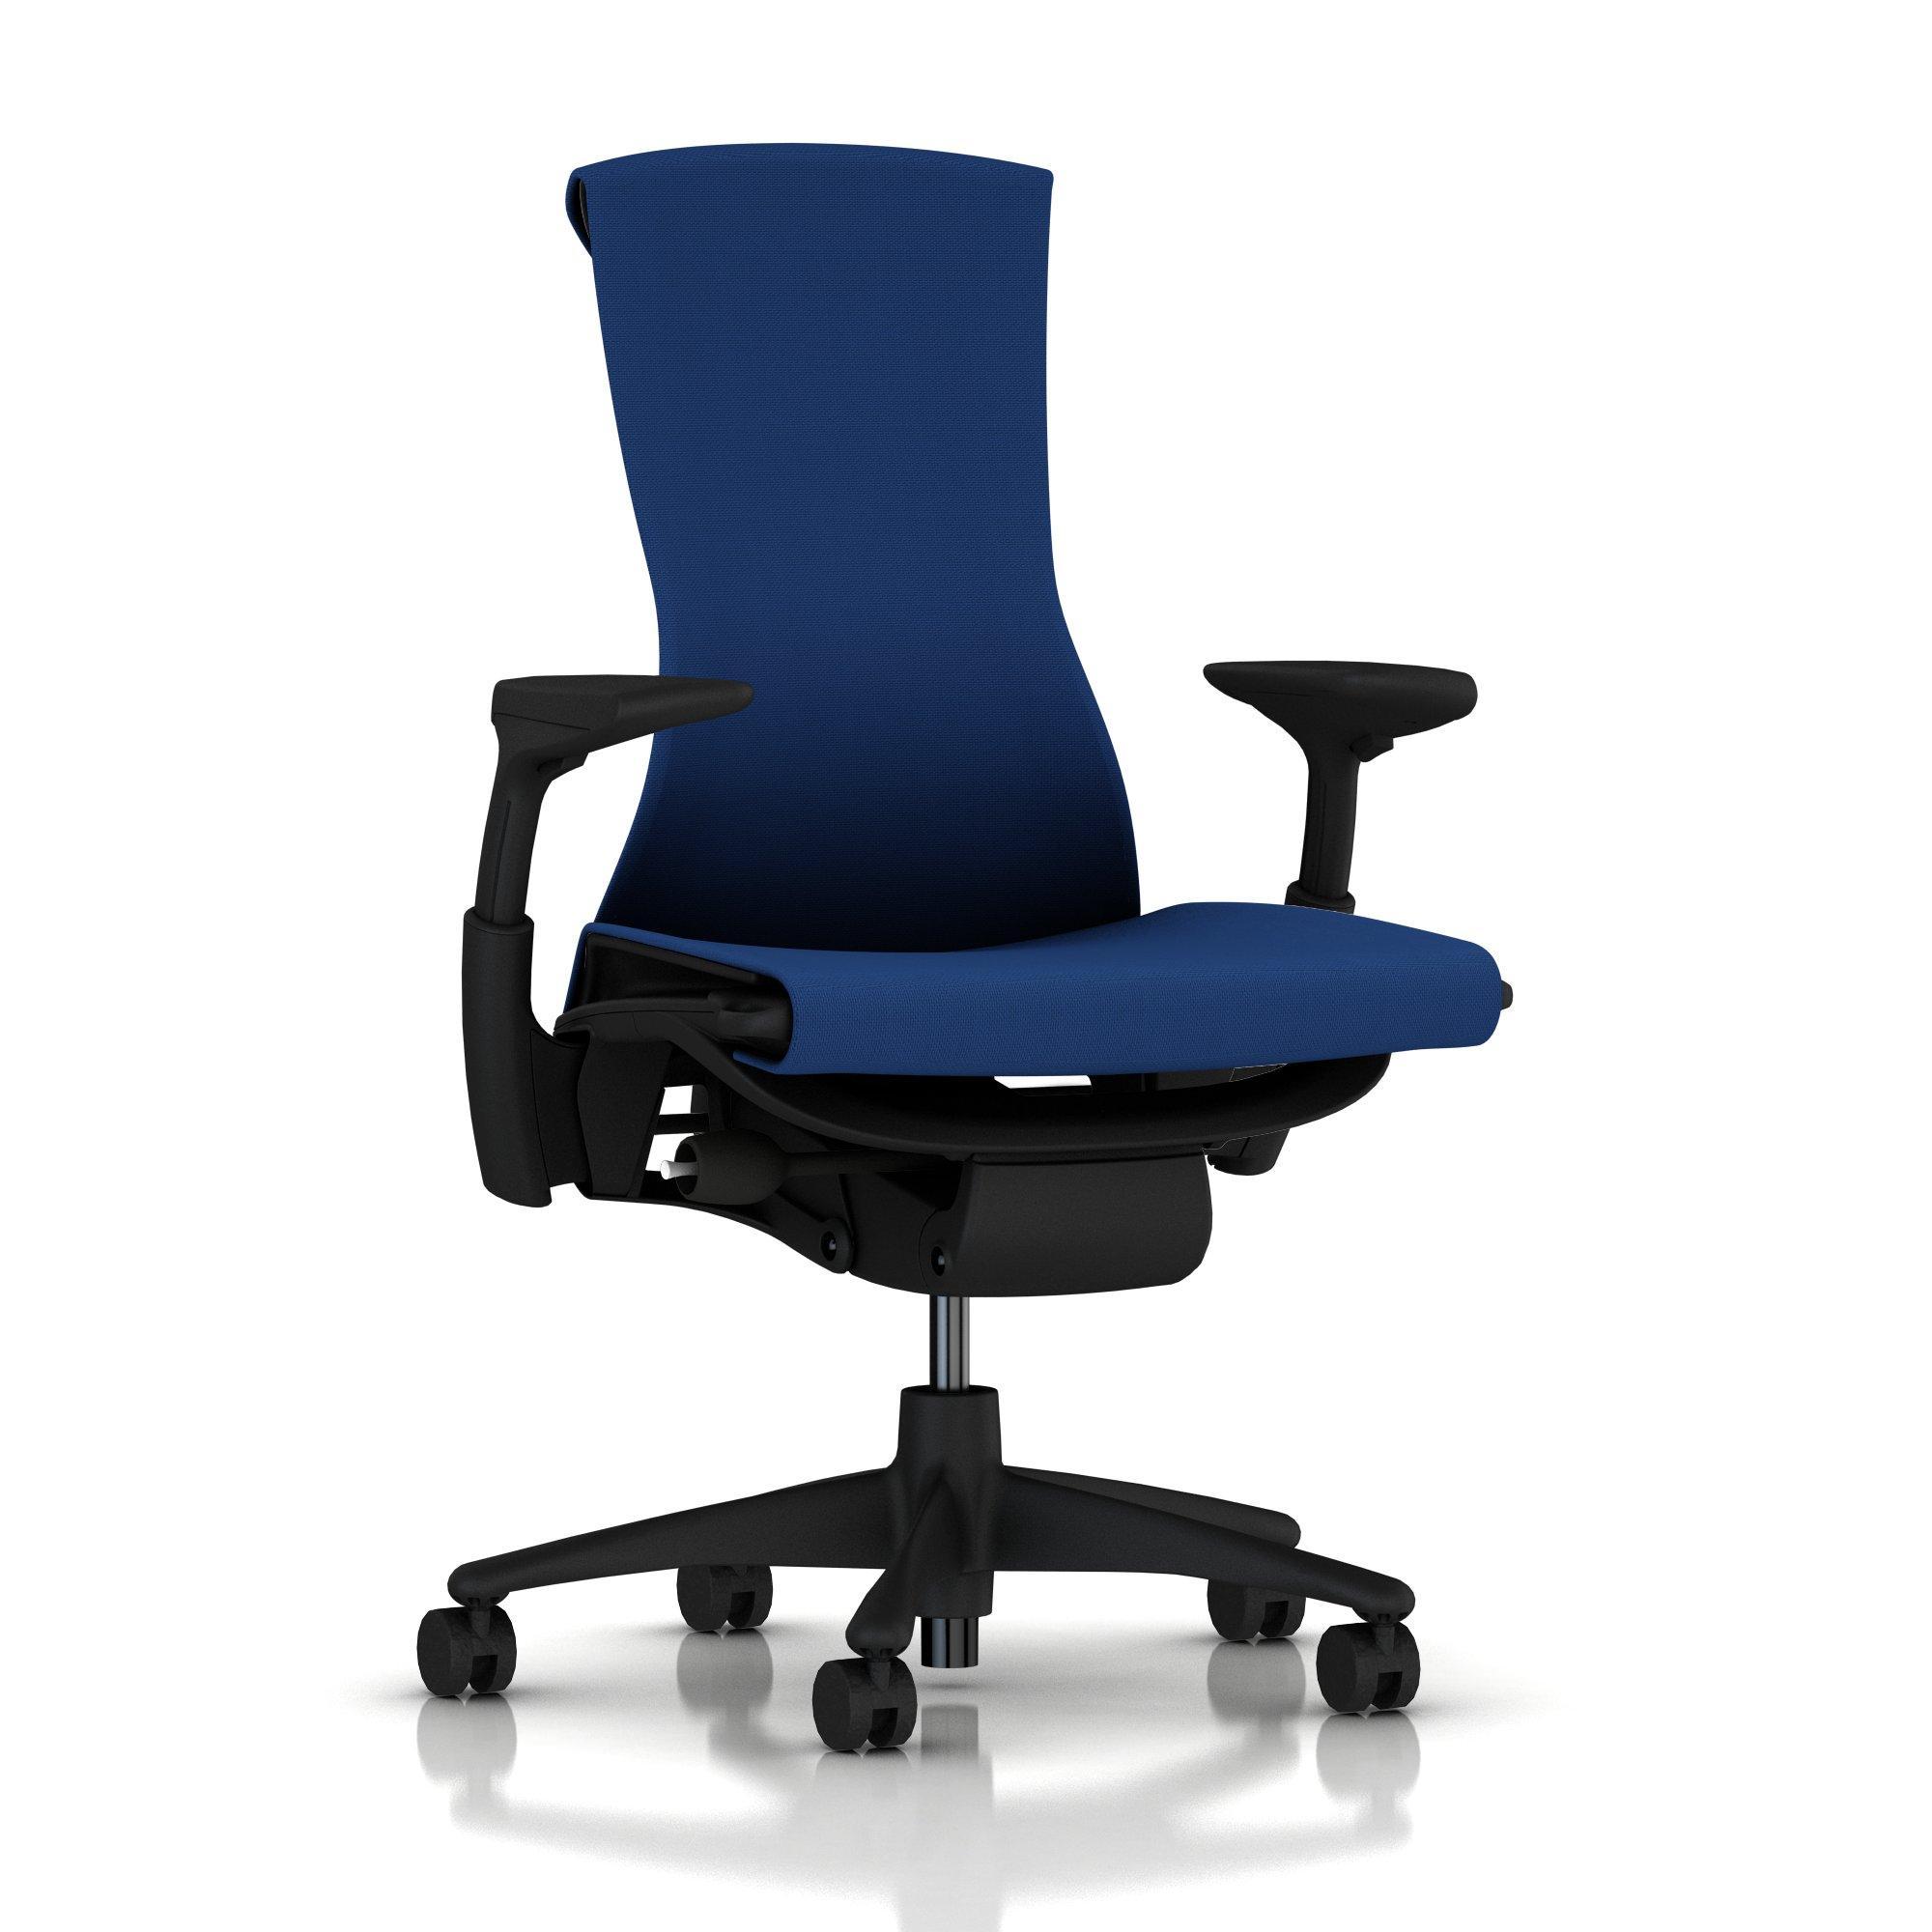 Herman Miller Embody Chair Berry Blue Rhythm with Graphite Frame